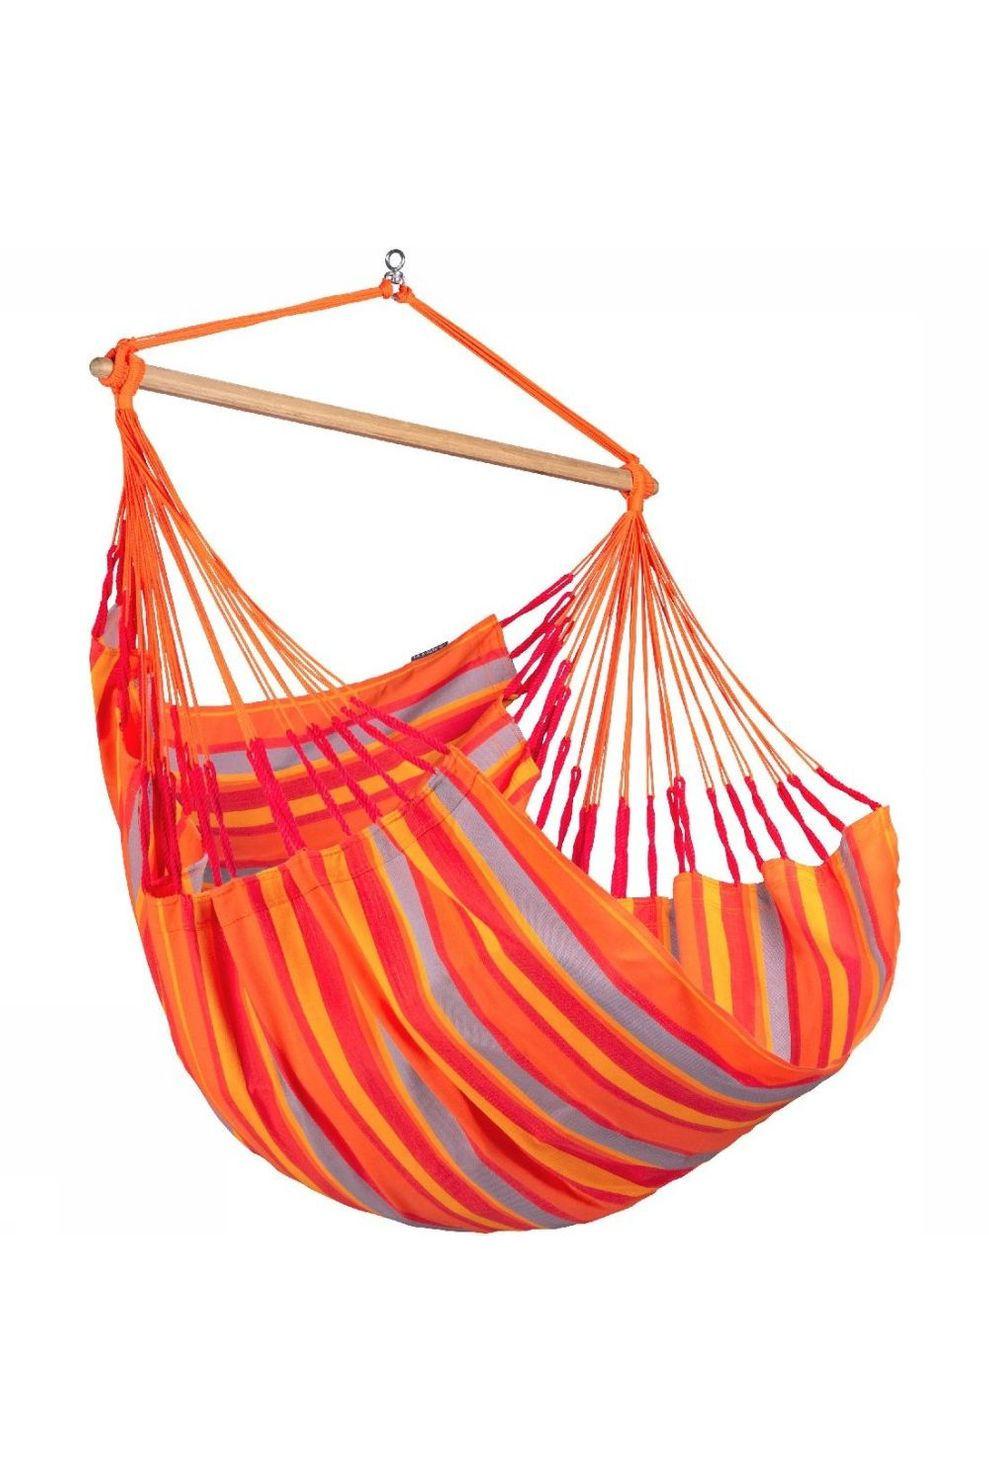 La Siesta Hangmat Domingo Hammock Chair - Rood/Oranje